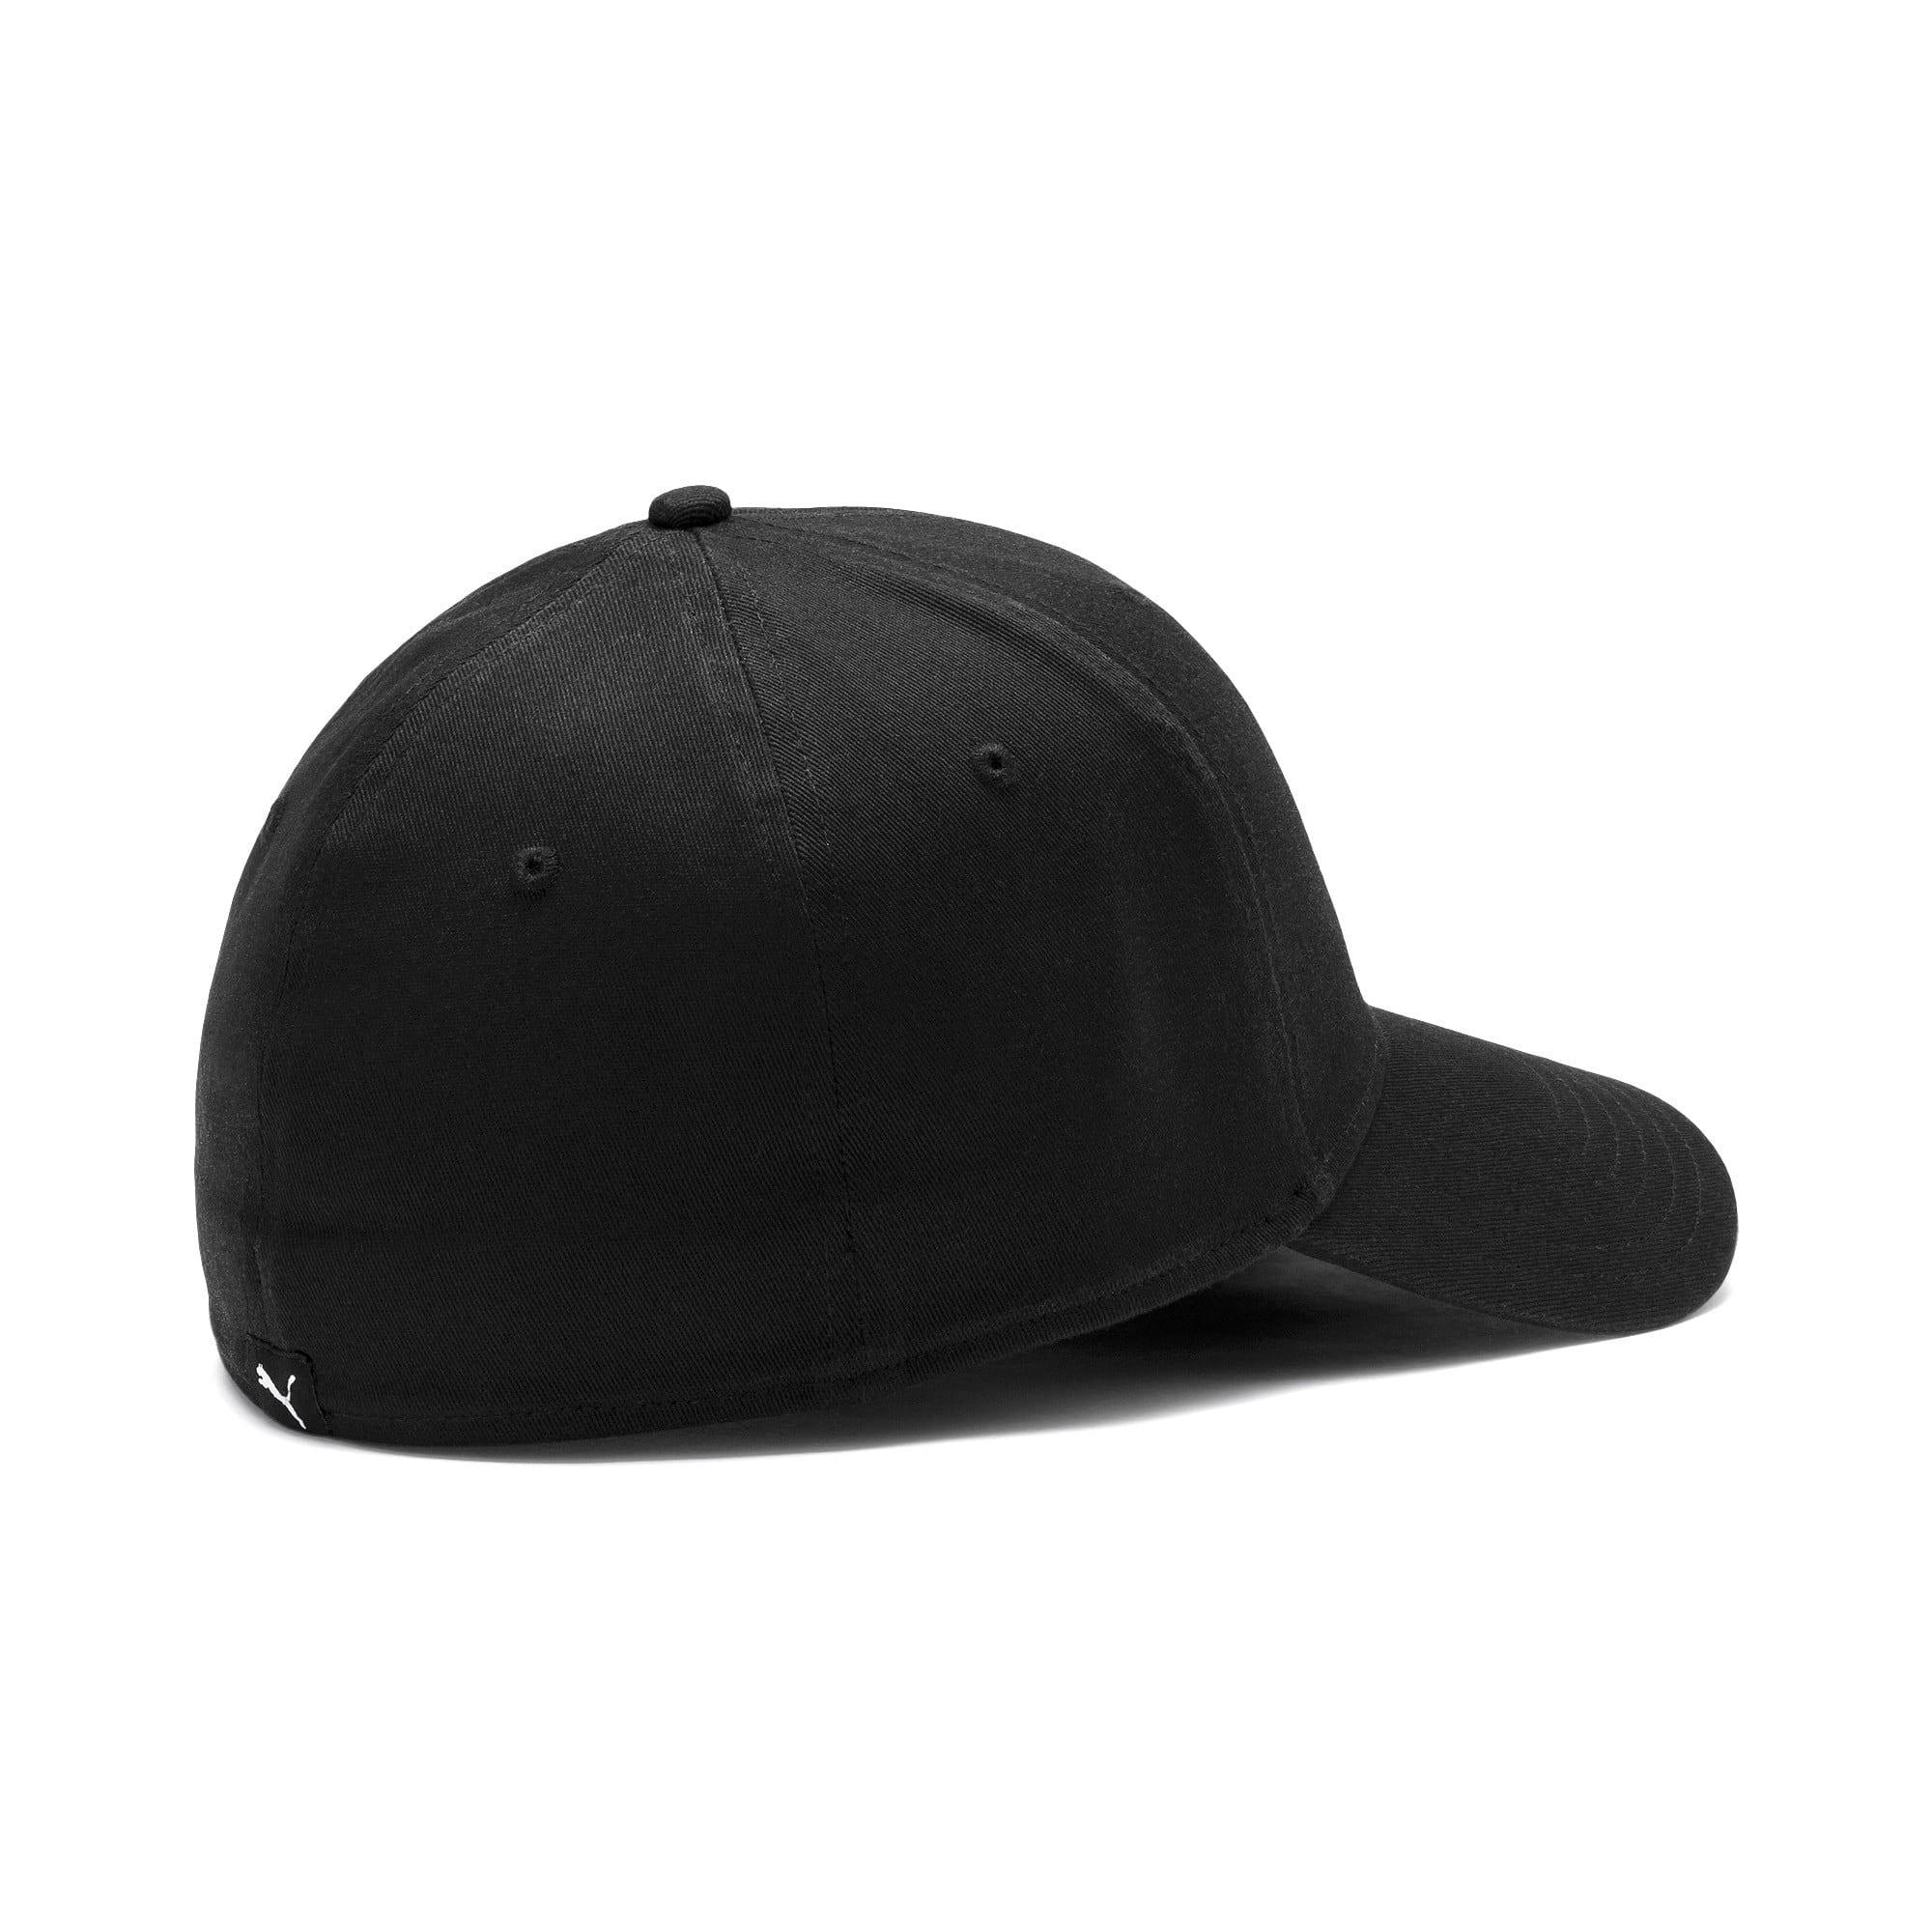 Thumbnail 3 of Stretchfit Baseball Cap, Puma Black, medium